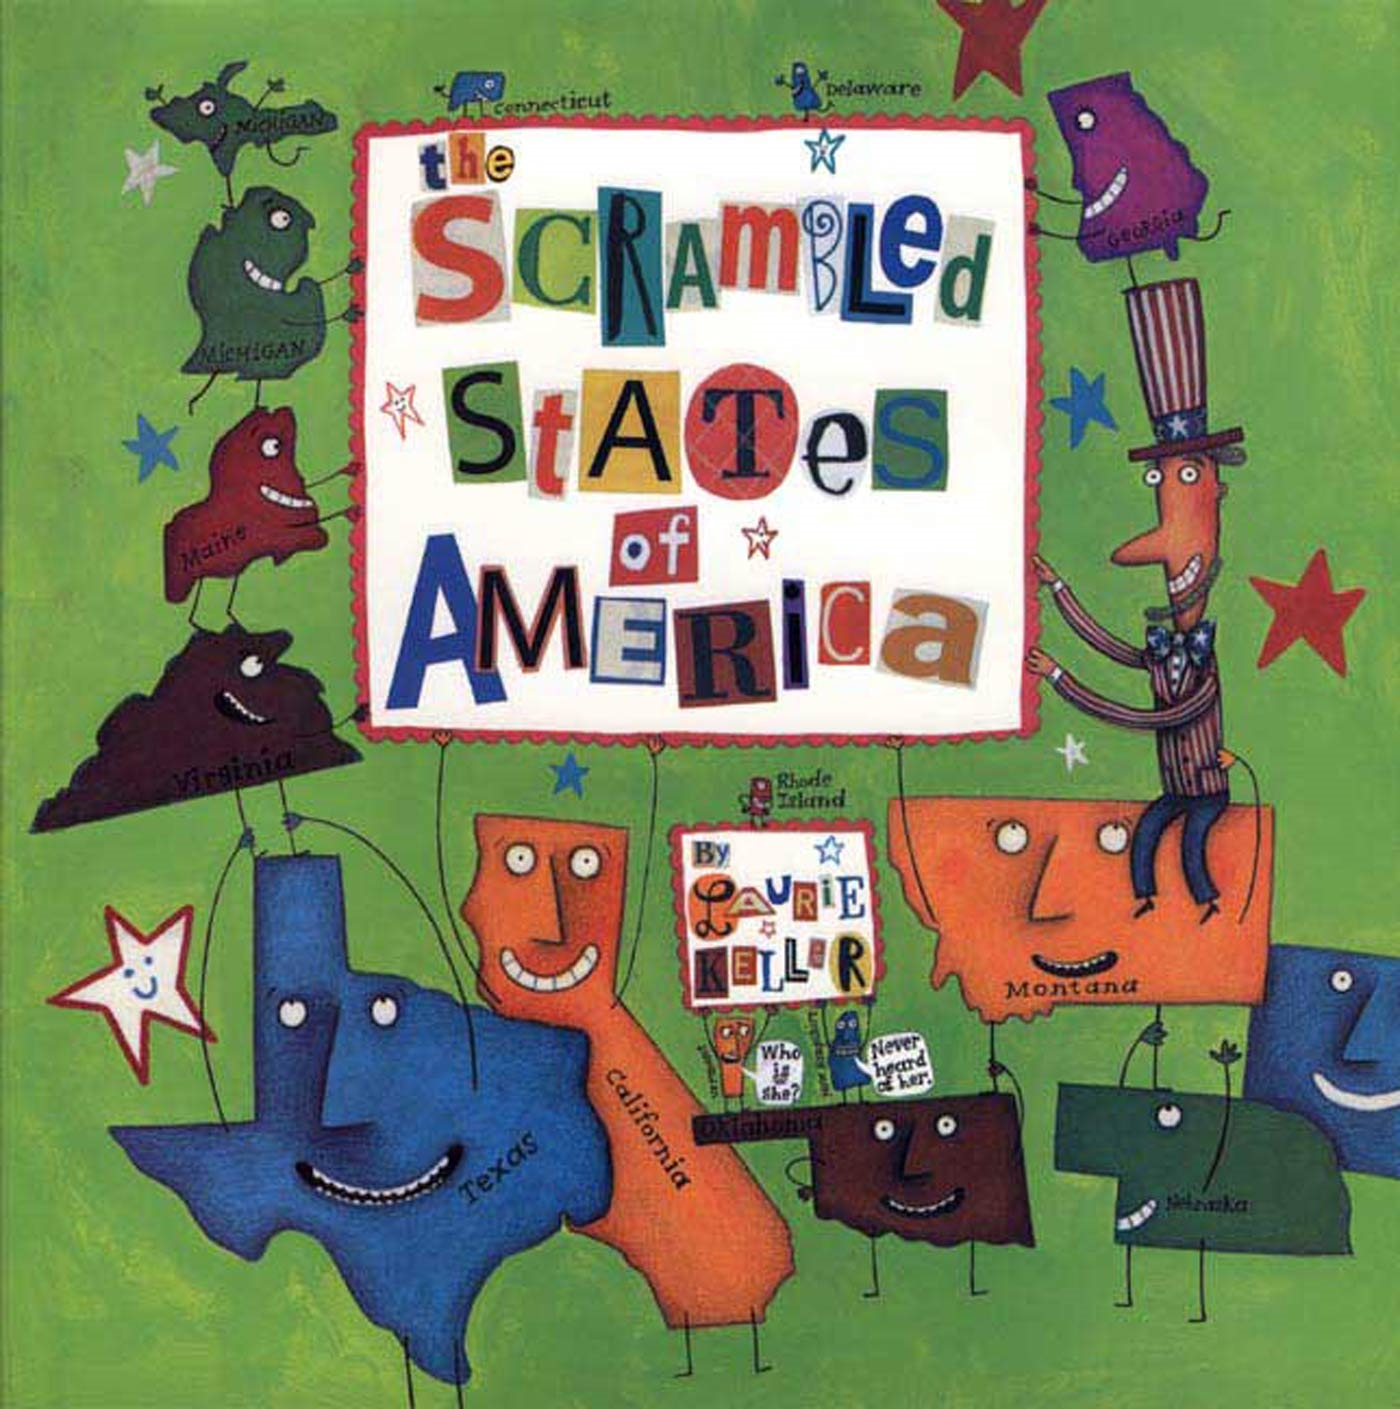 The Scrambled States of America